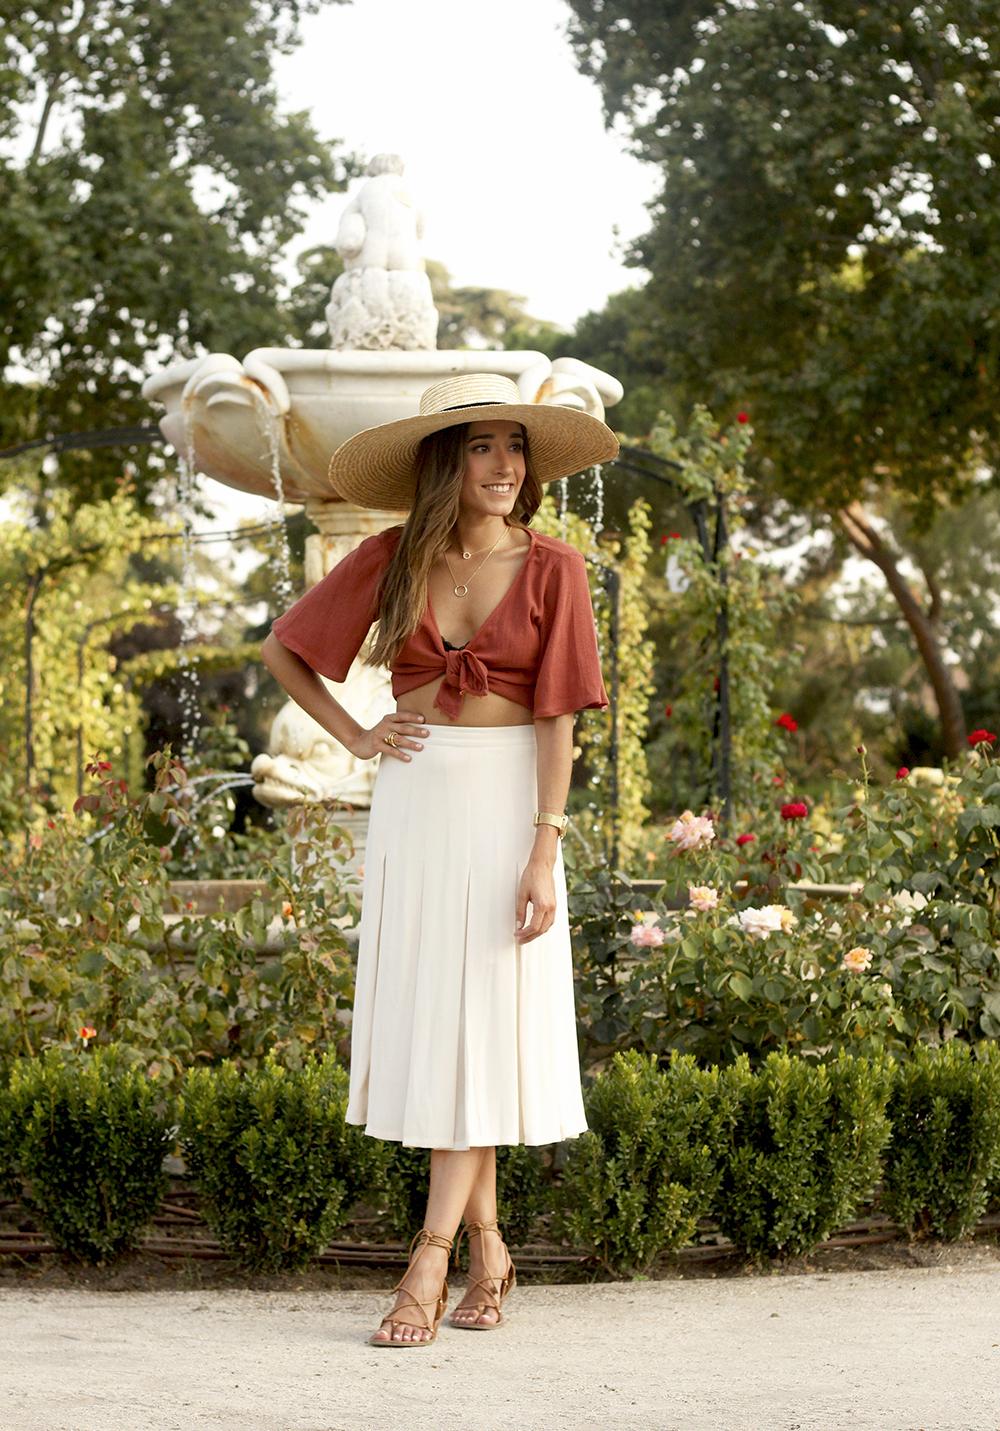 terracotta top white midi skirt straw hat flat sandals street style 201801